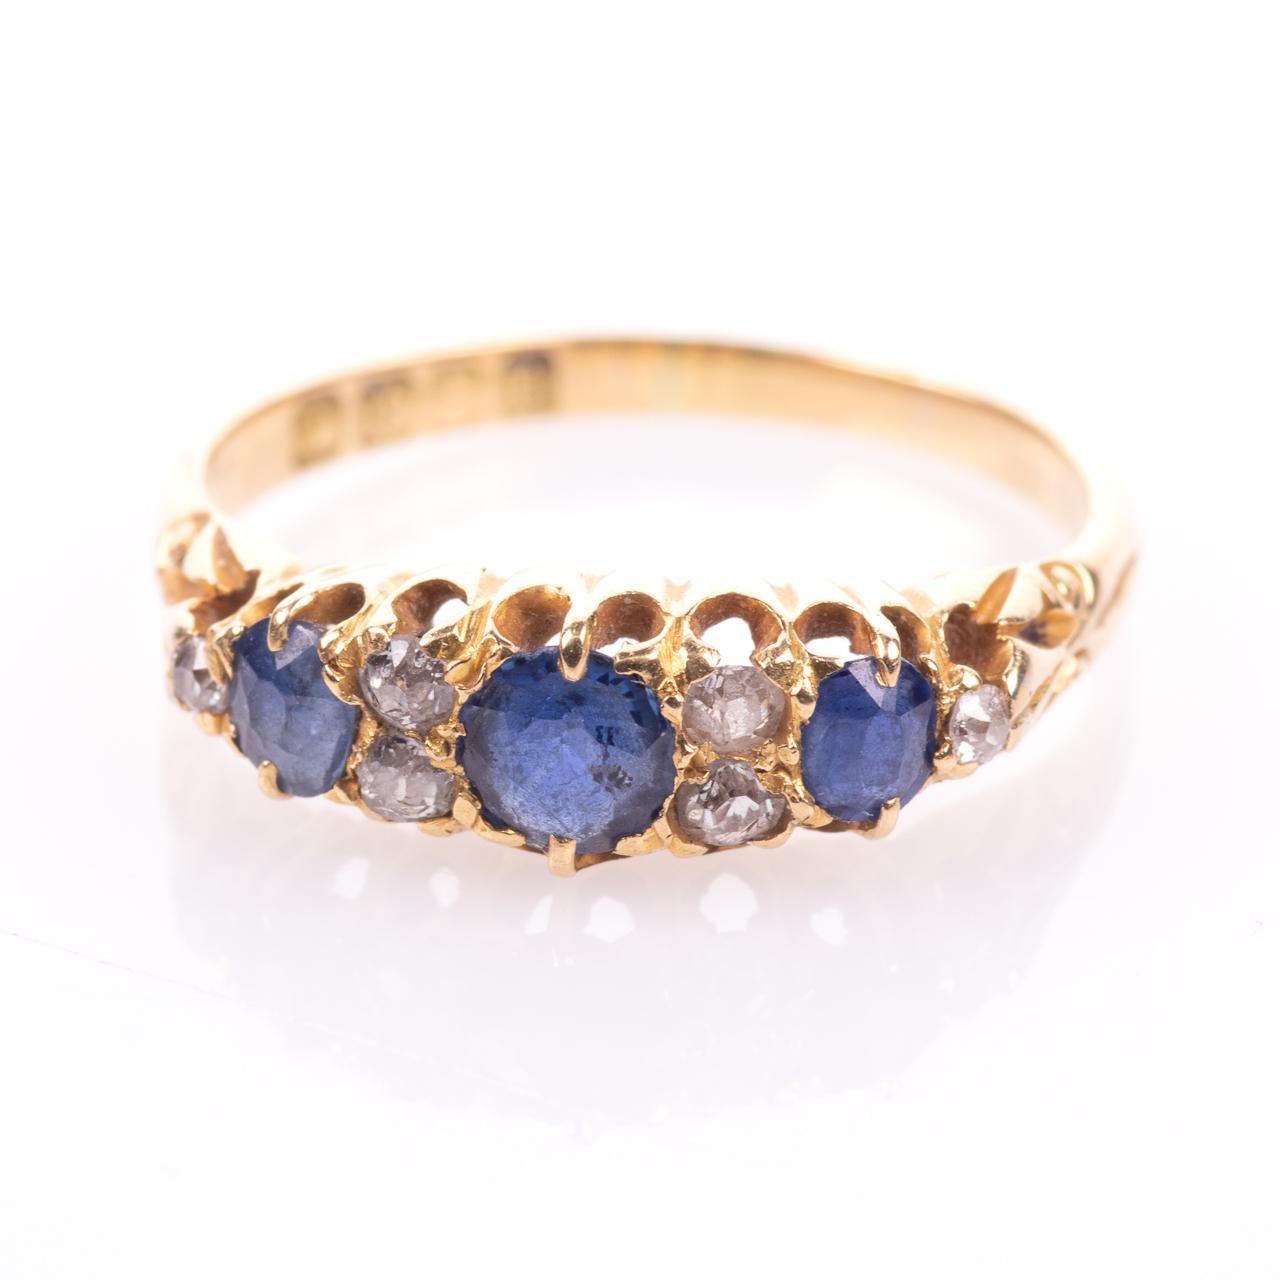 18ct Gold George V 1ct Sapphire & Diamond Ring London 1908 - Image 3 of 7